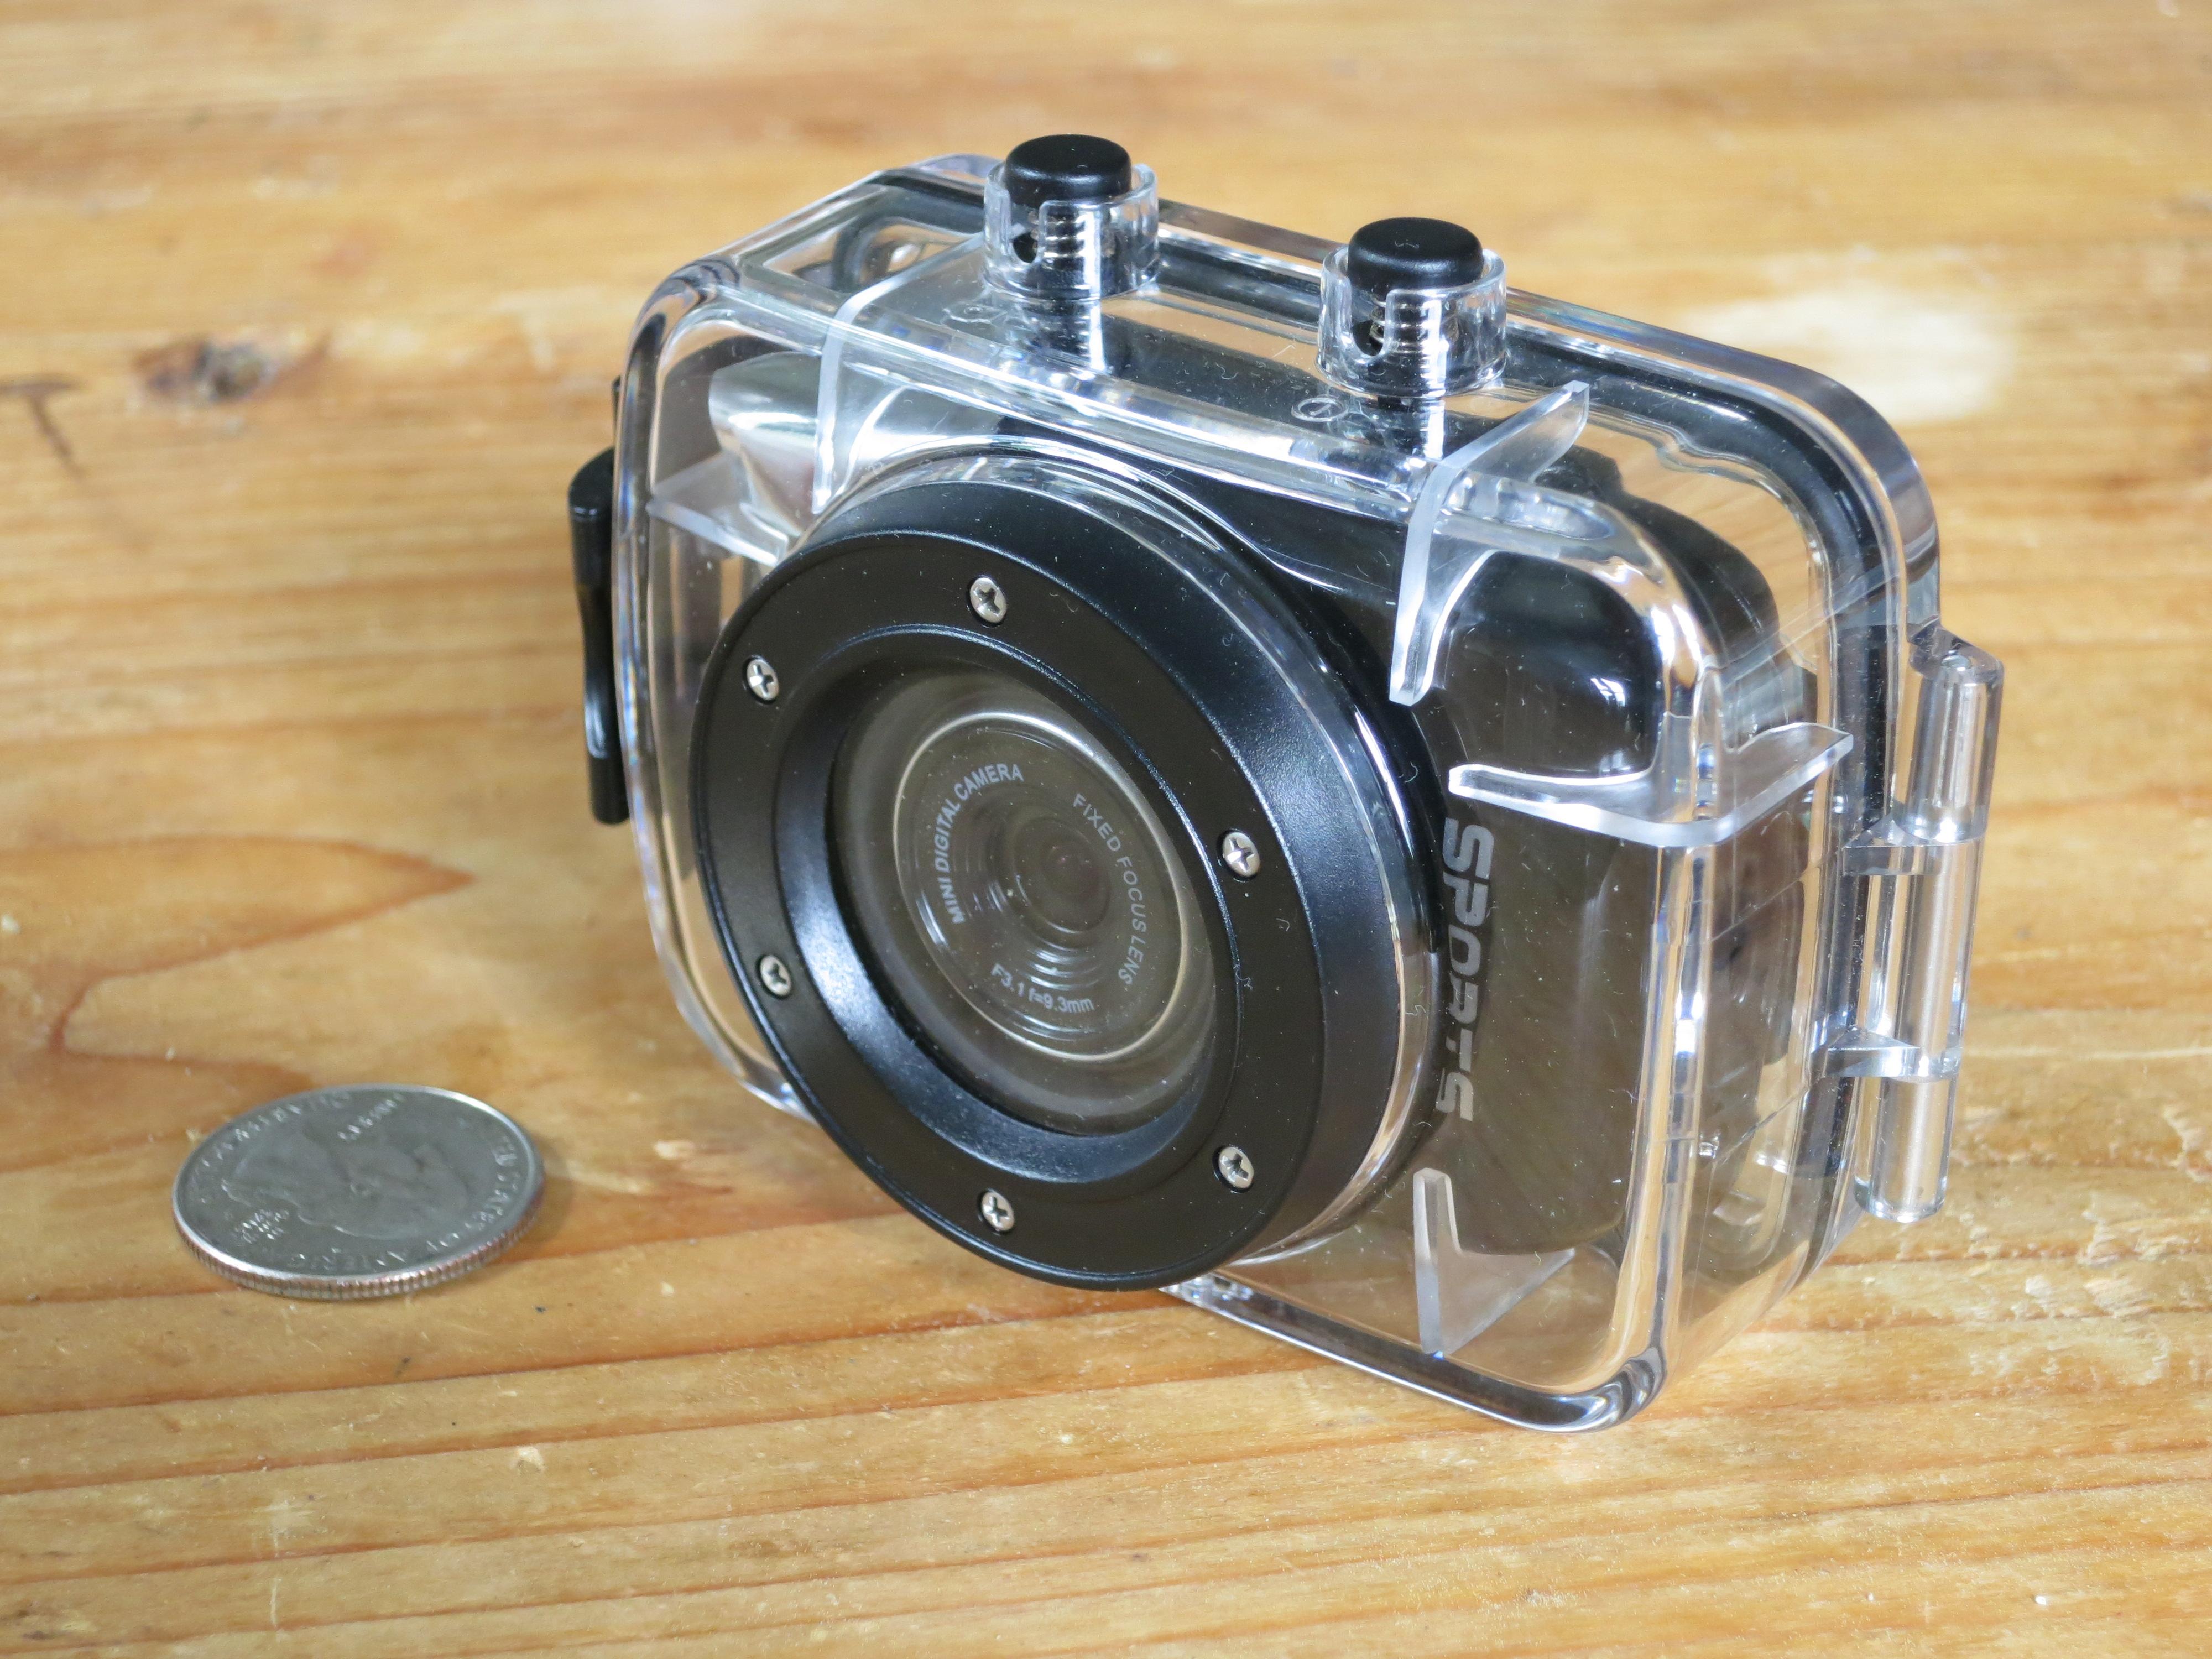 🎈 Public Lab: Small camera conversion tests